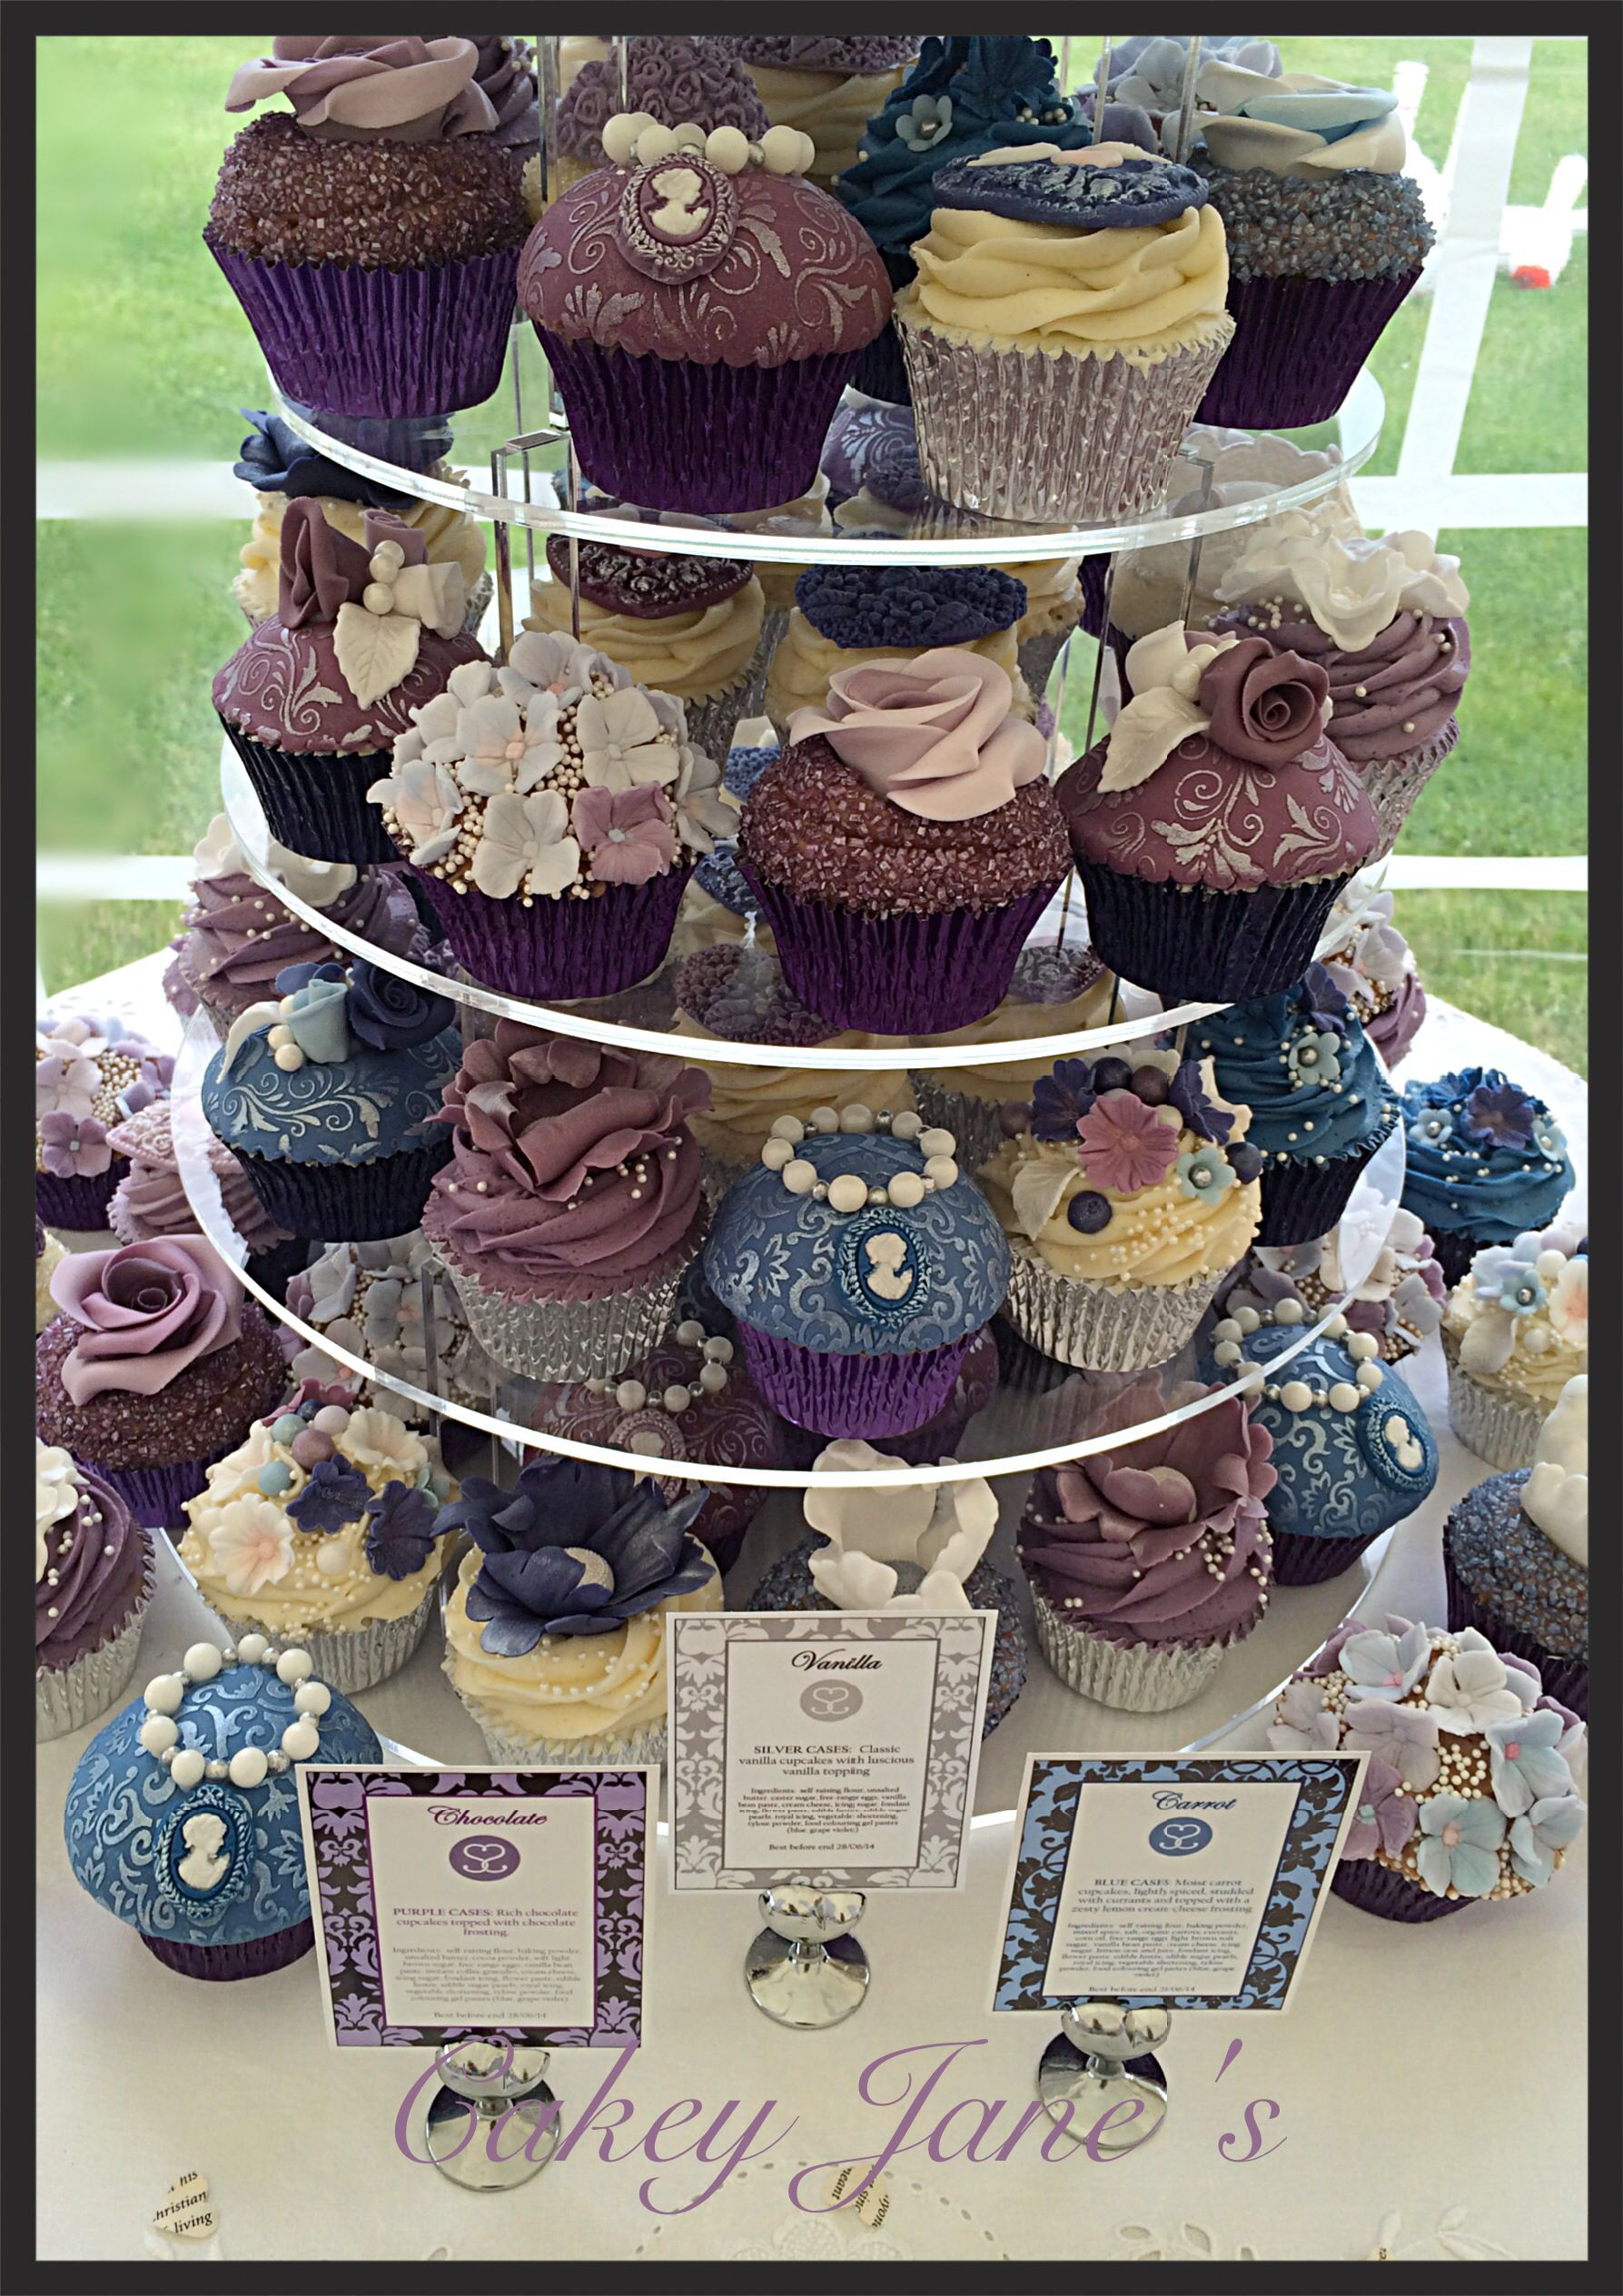 Blue themed wedding decor  Vintagethemed wedding cupcake tower purple blue and silver theme